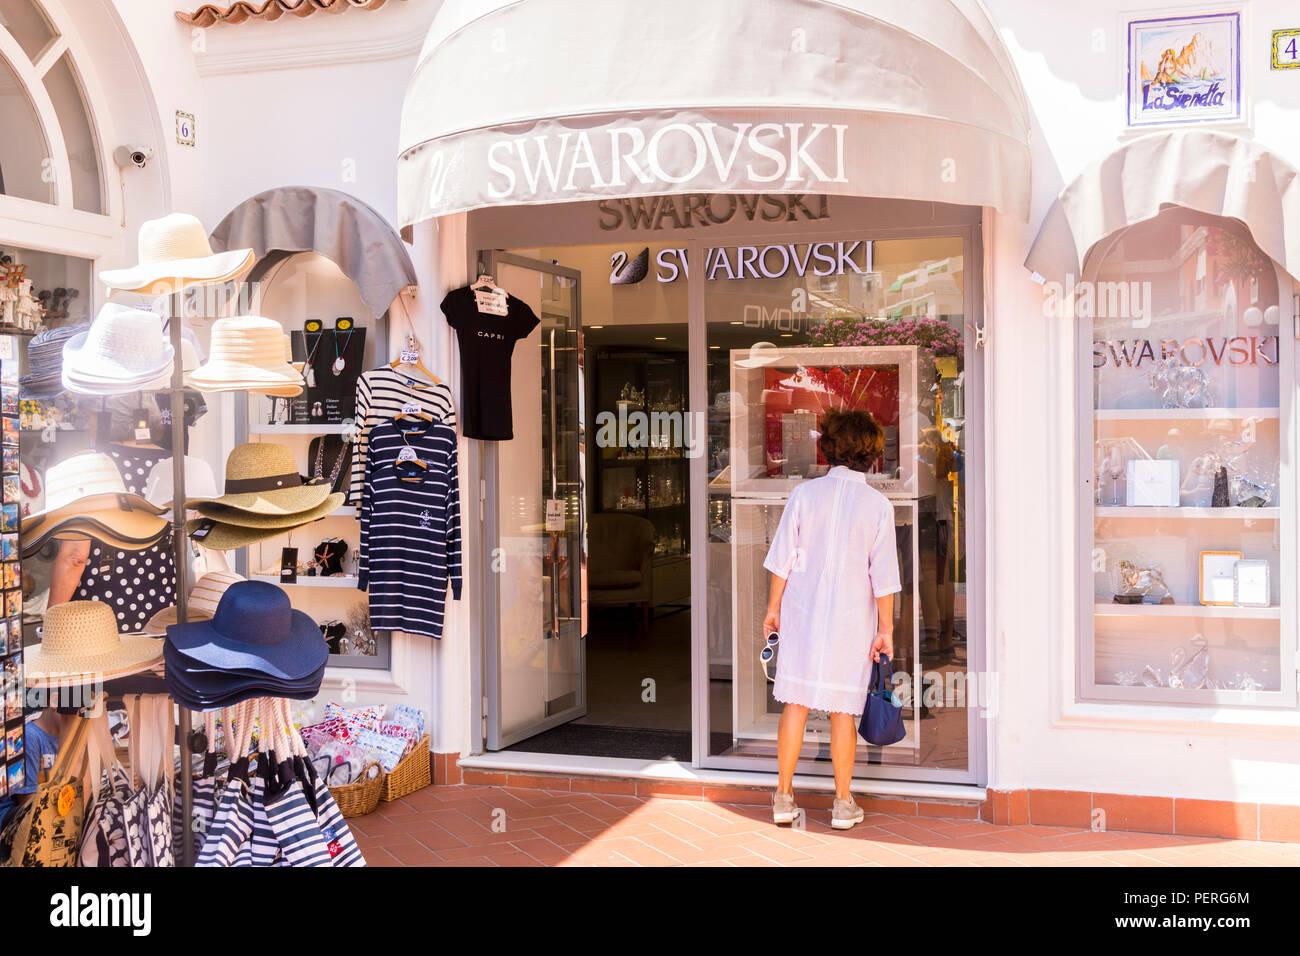 053955db61c Swarovski Jewellery Shop , Capri Italy Europe, shopping concept - Stock  Image